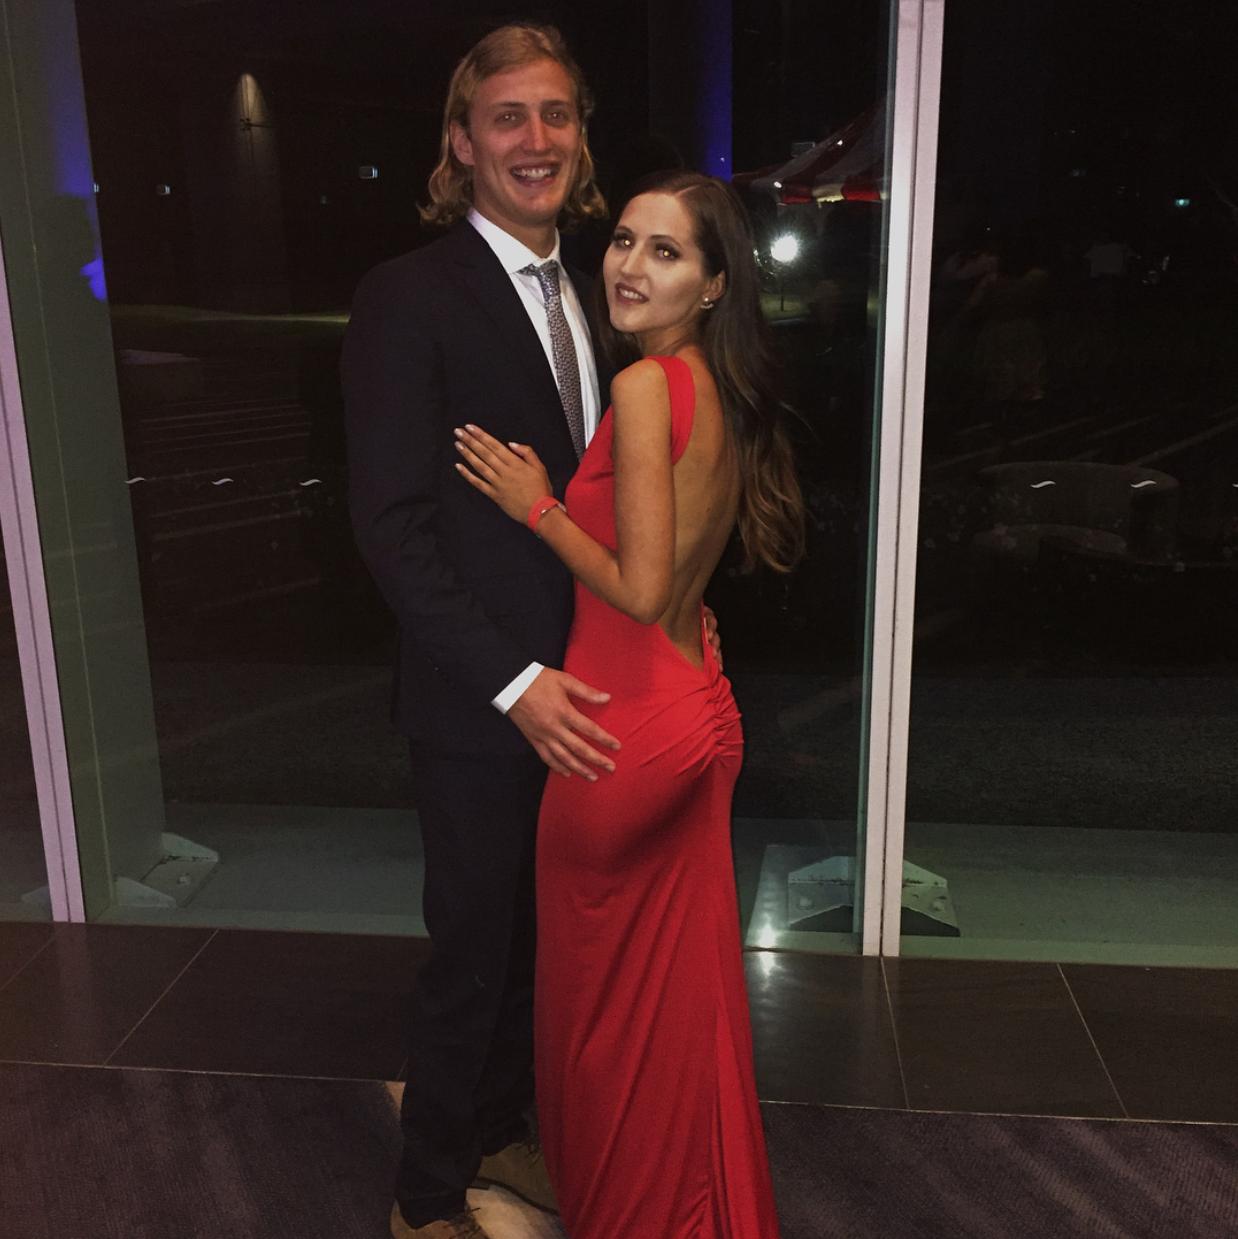 Alexandra - Beautiful at the Ball